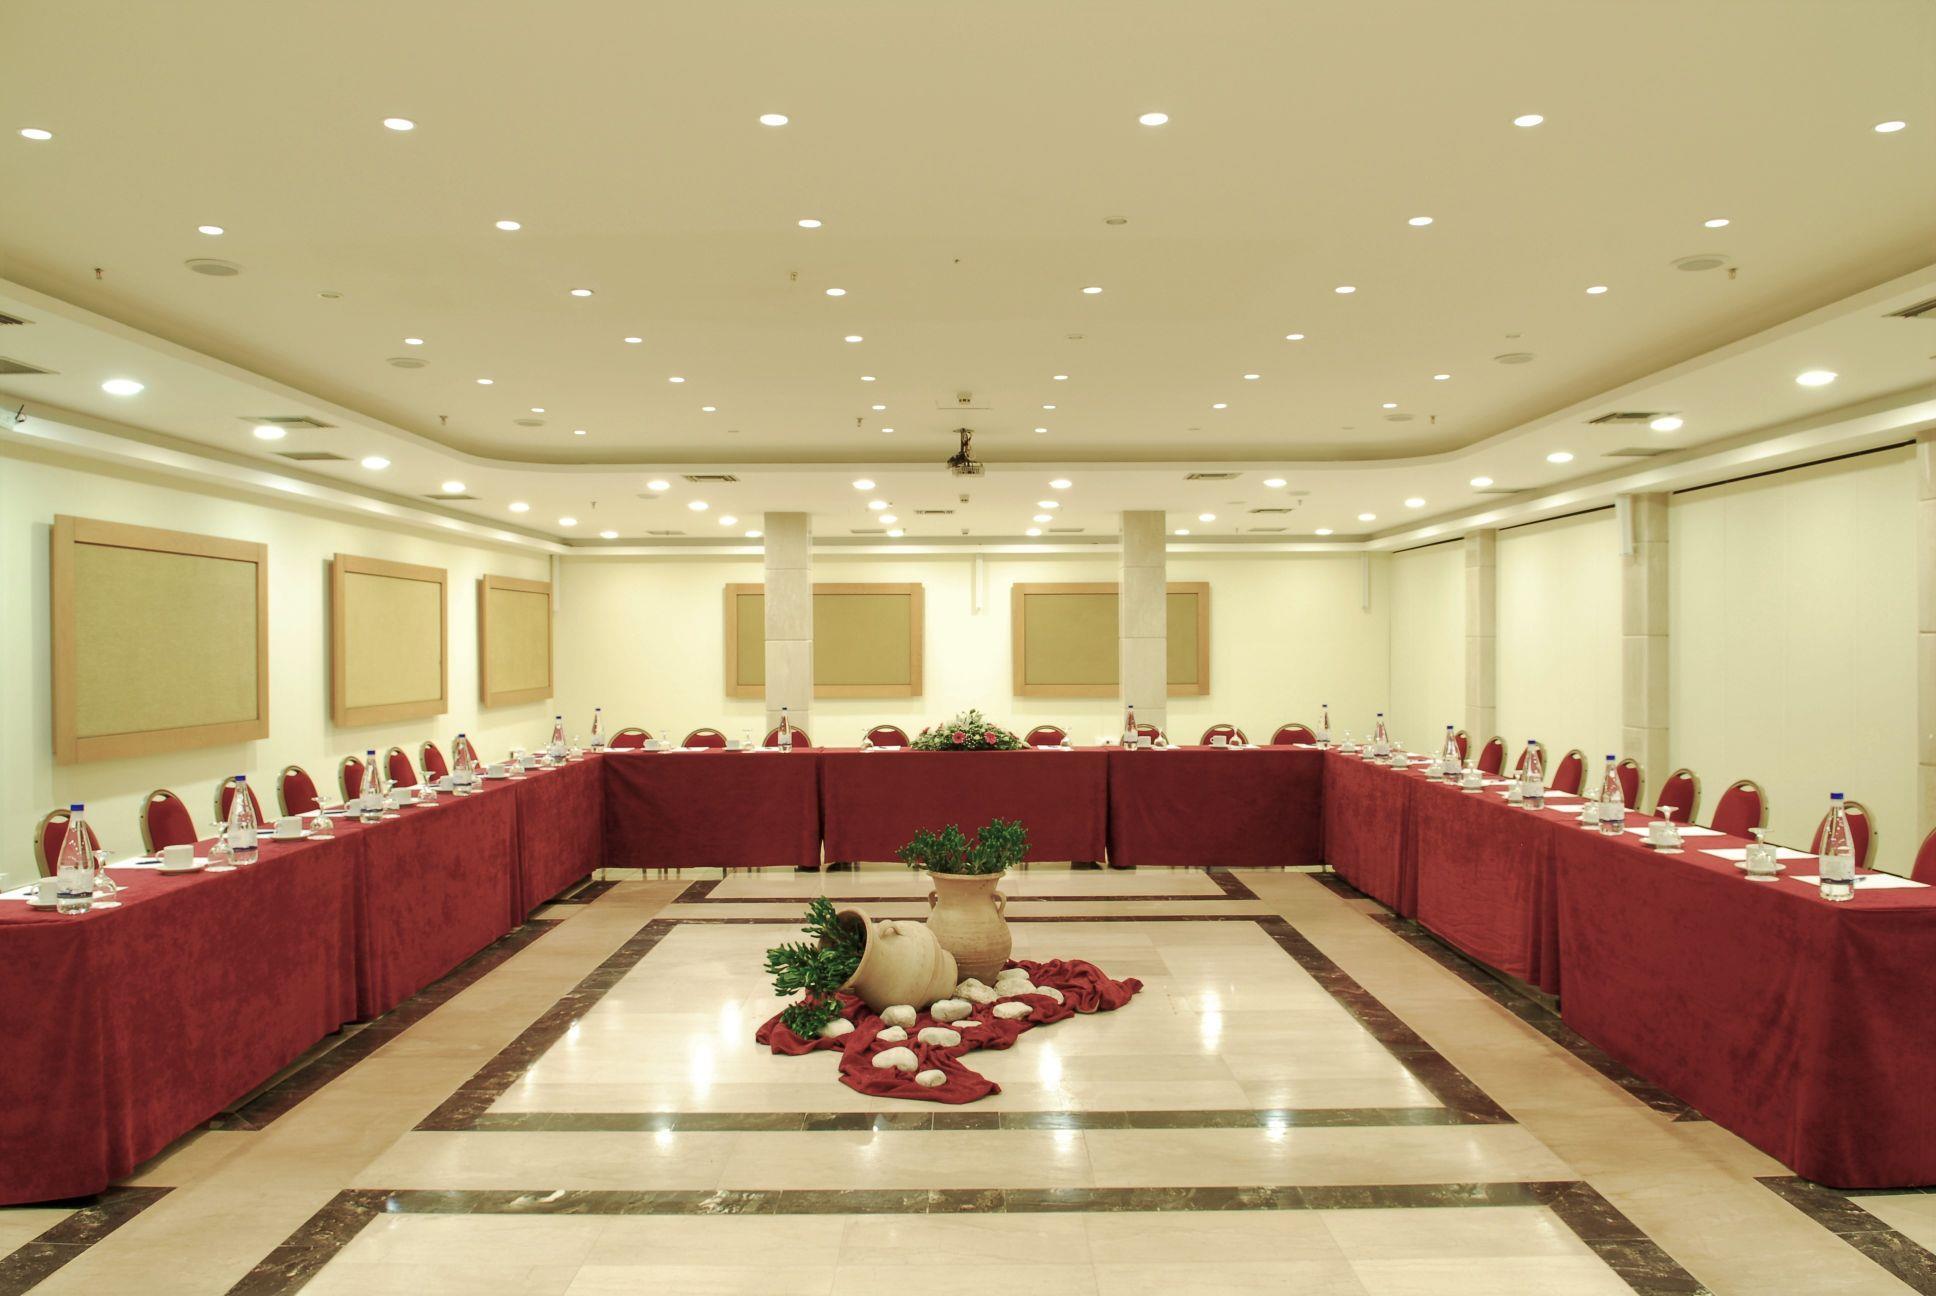 http://www.orextravel.sk/OREX/hotelphotos/royal-belvedere-general-0052.jpg